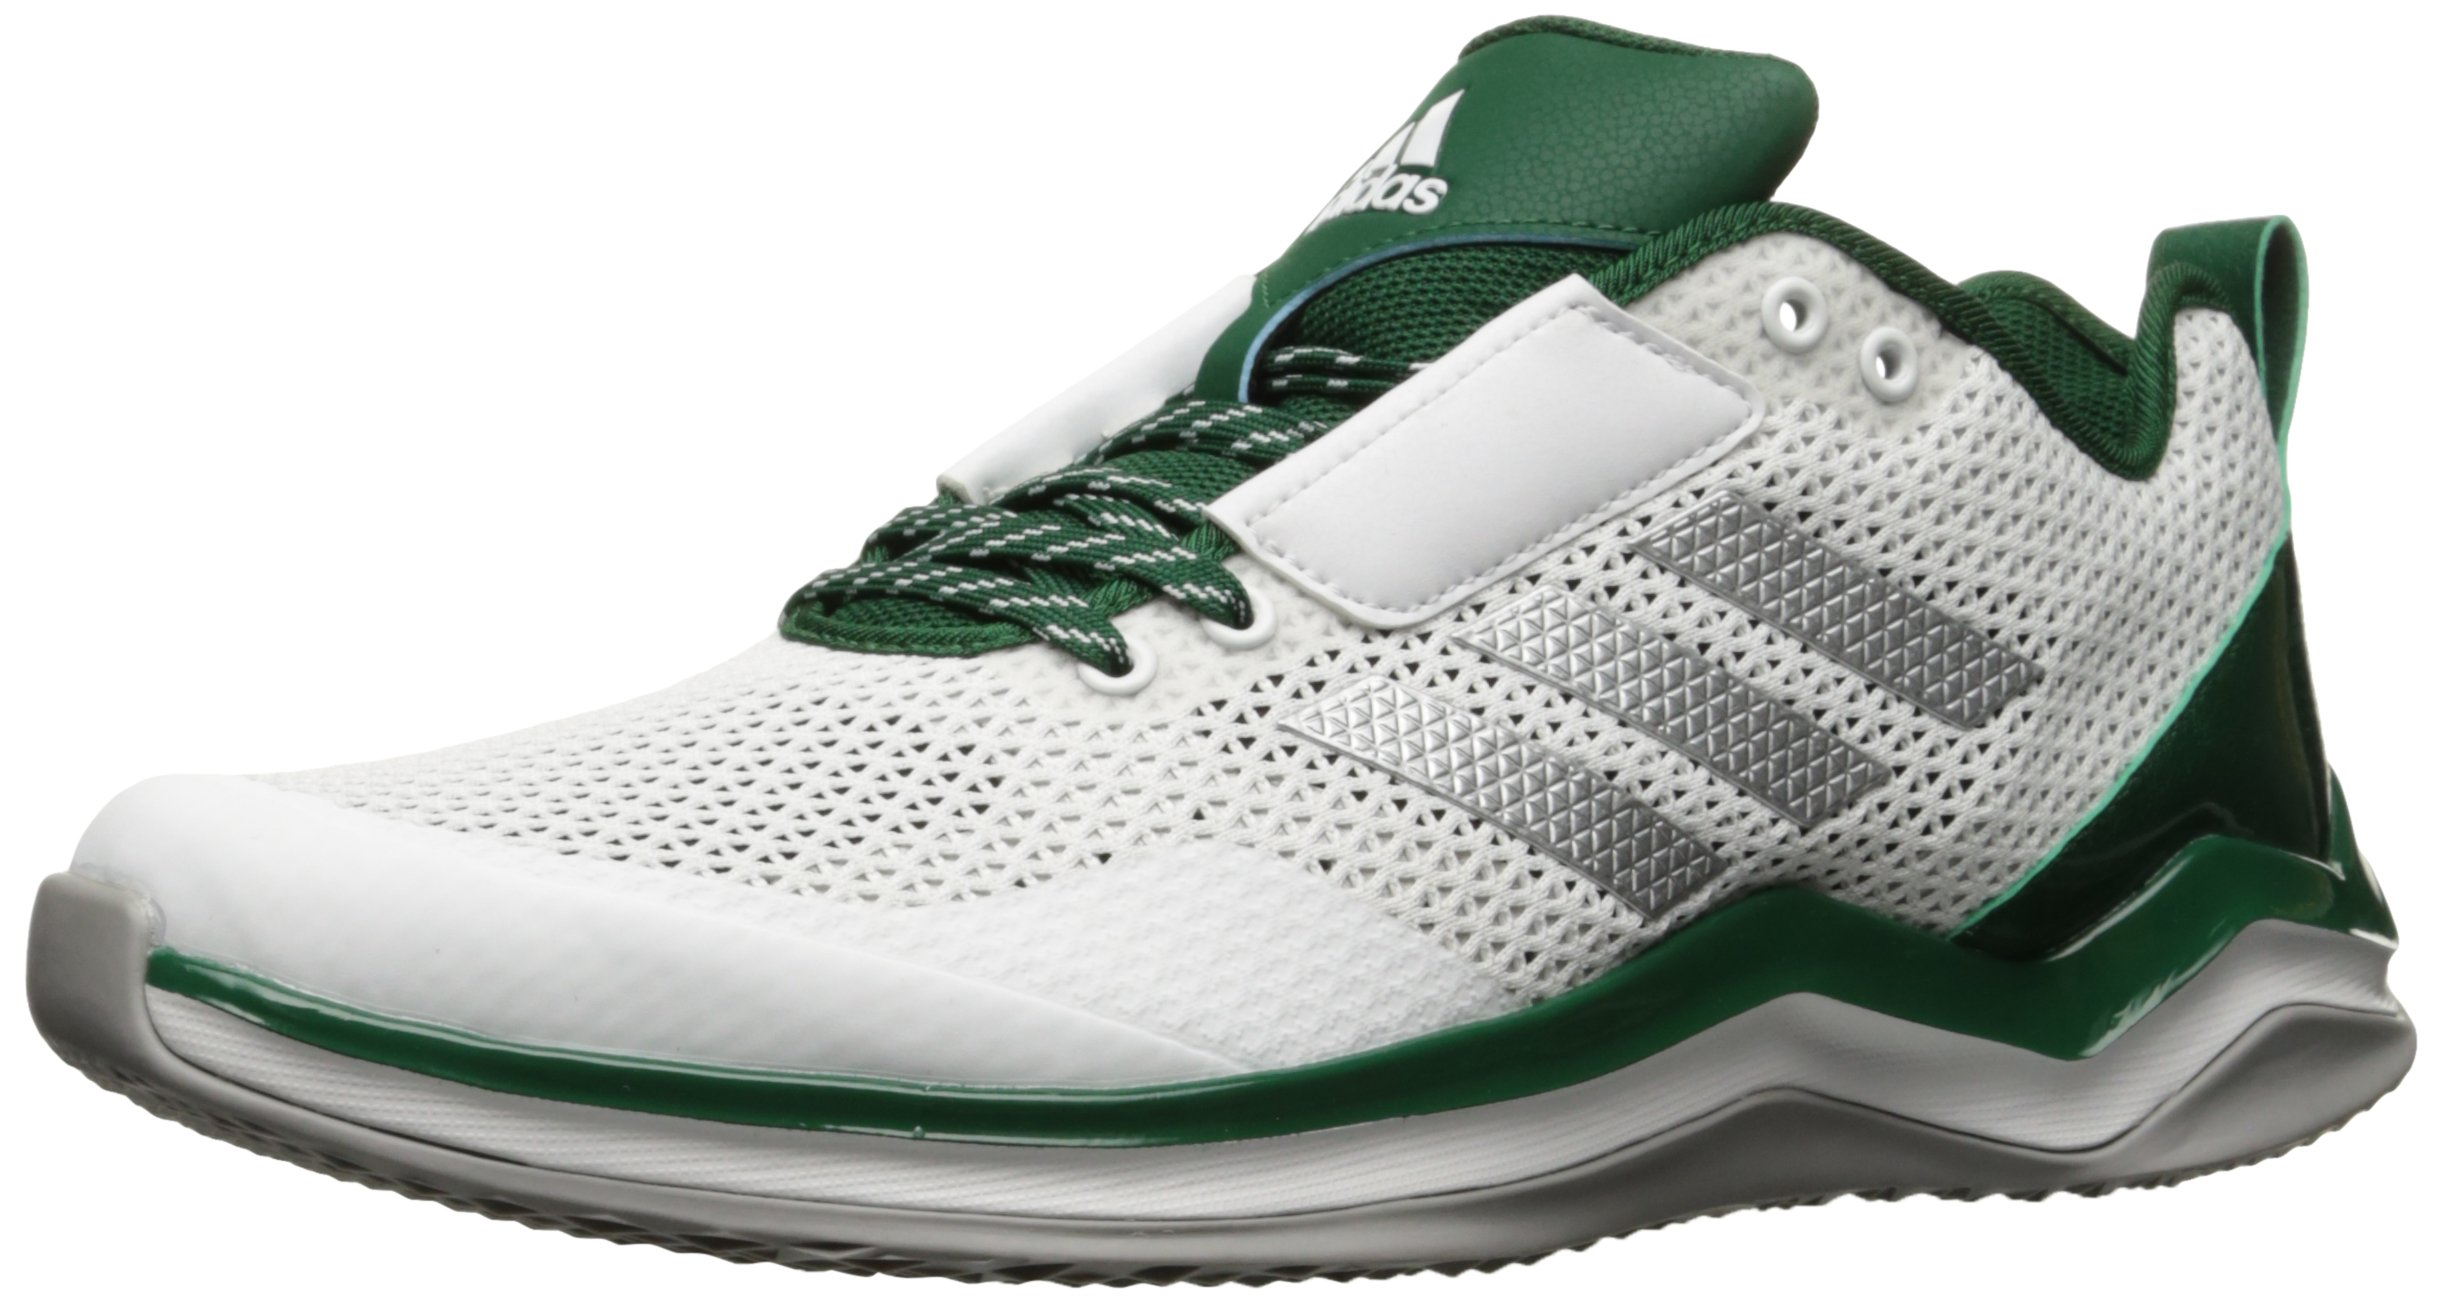 adidas Men's Freak X Carbon Mid Cross Trainer, White/Metallic Silver/Dark Green, (15 M US) by adidas